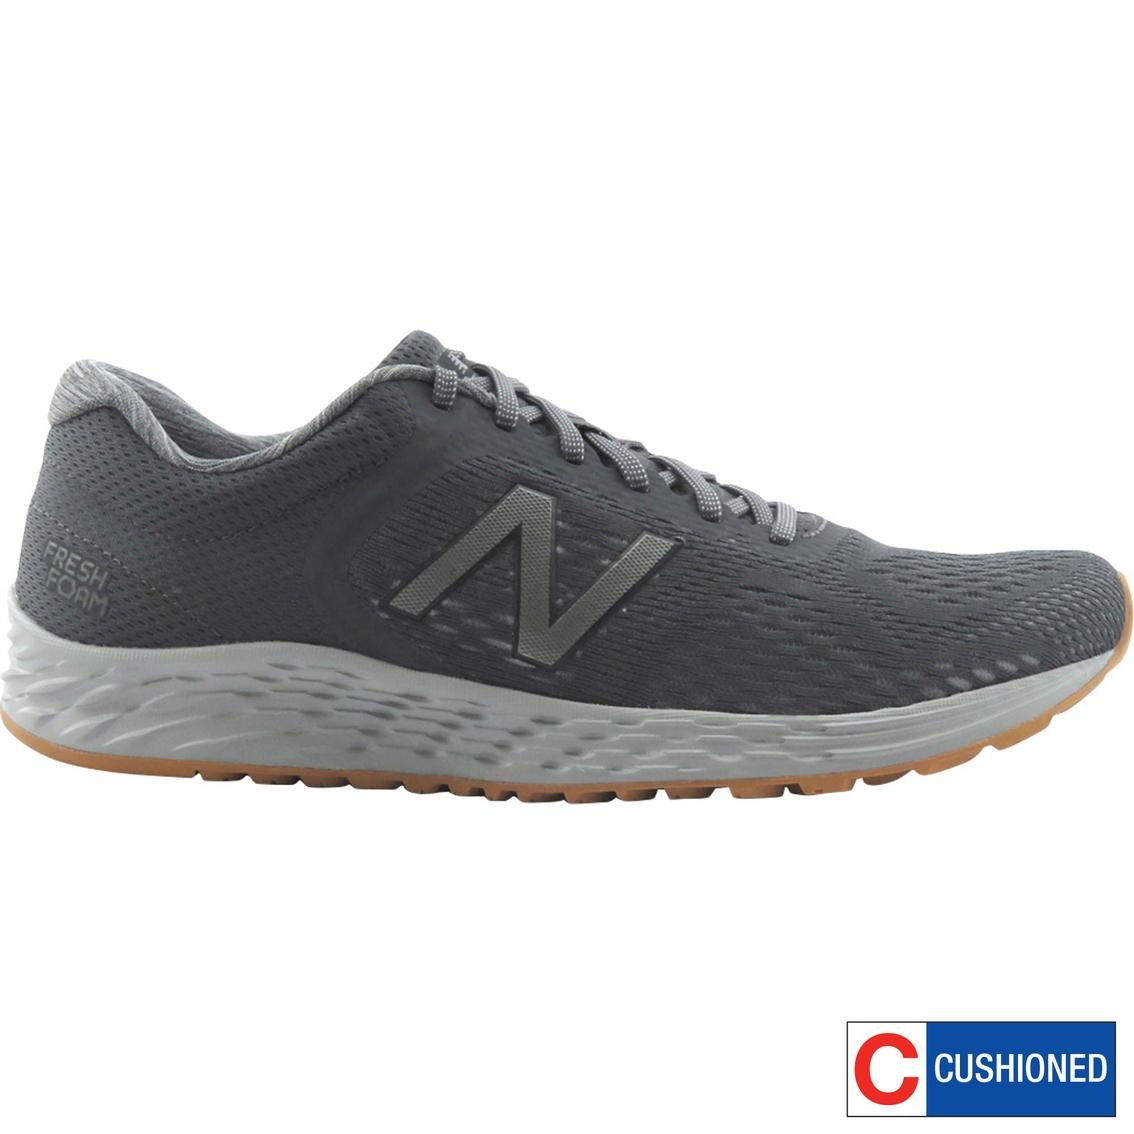 d49f69f3398f New Balance Men s Arishiv2 Cushioned Running Shoes Marisrg2 ...